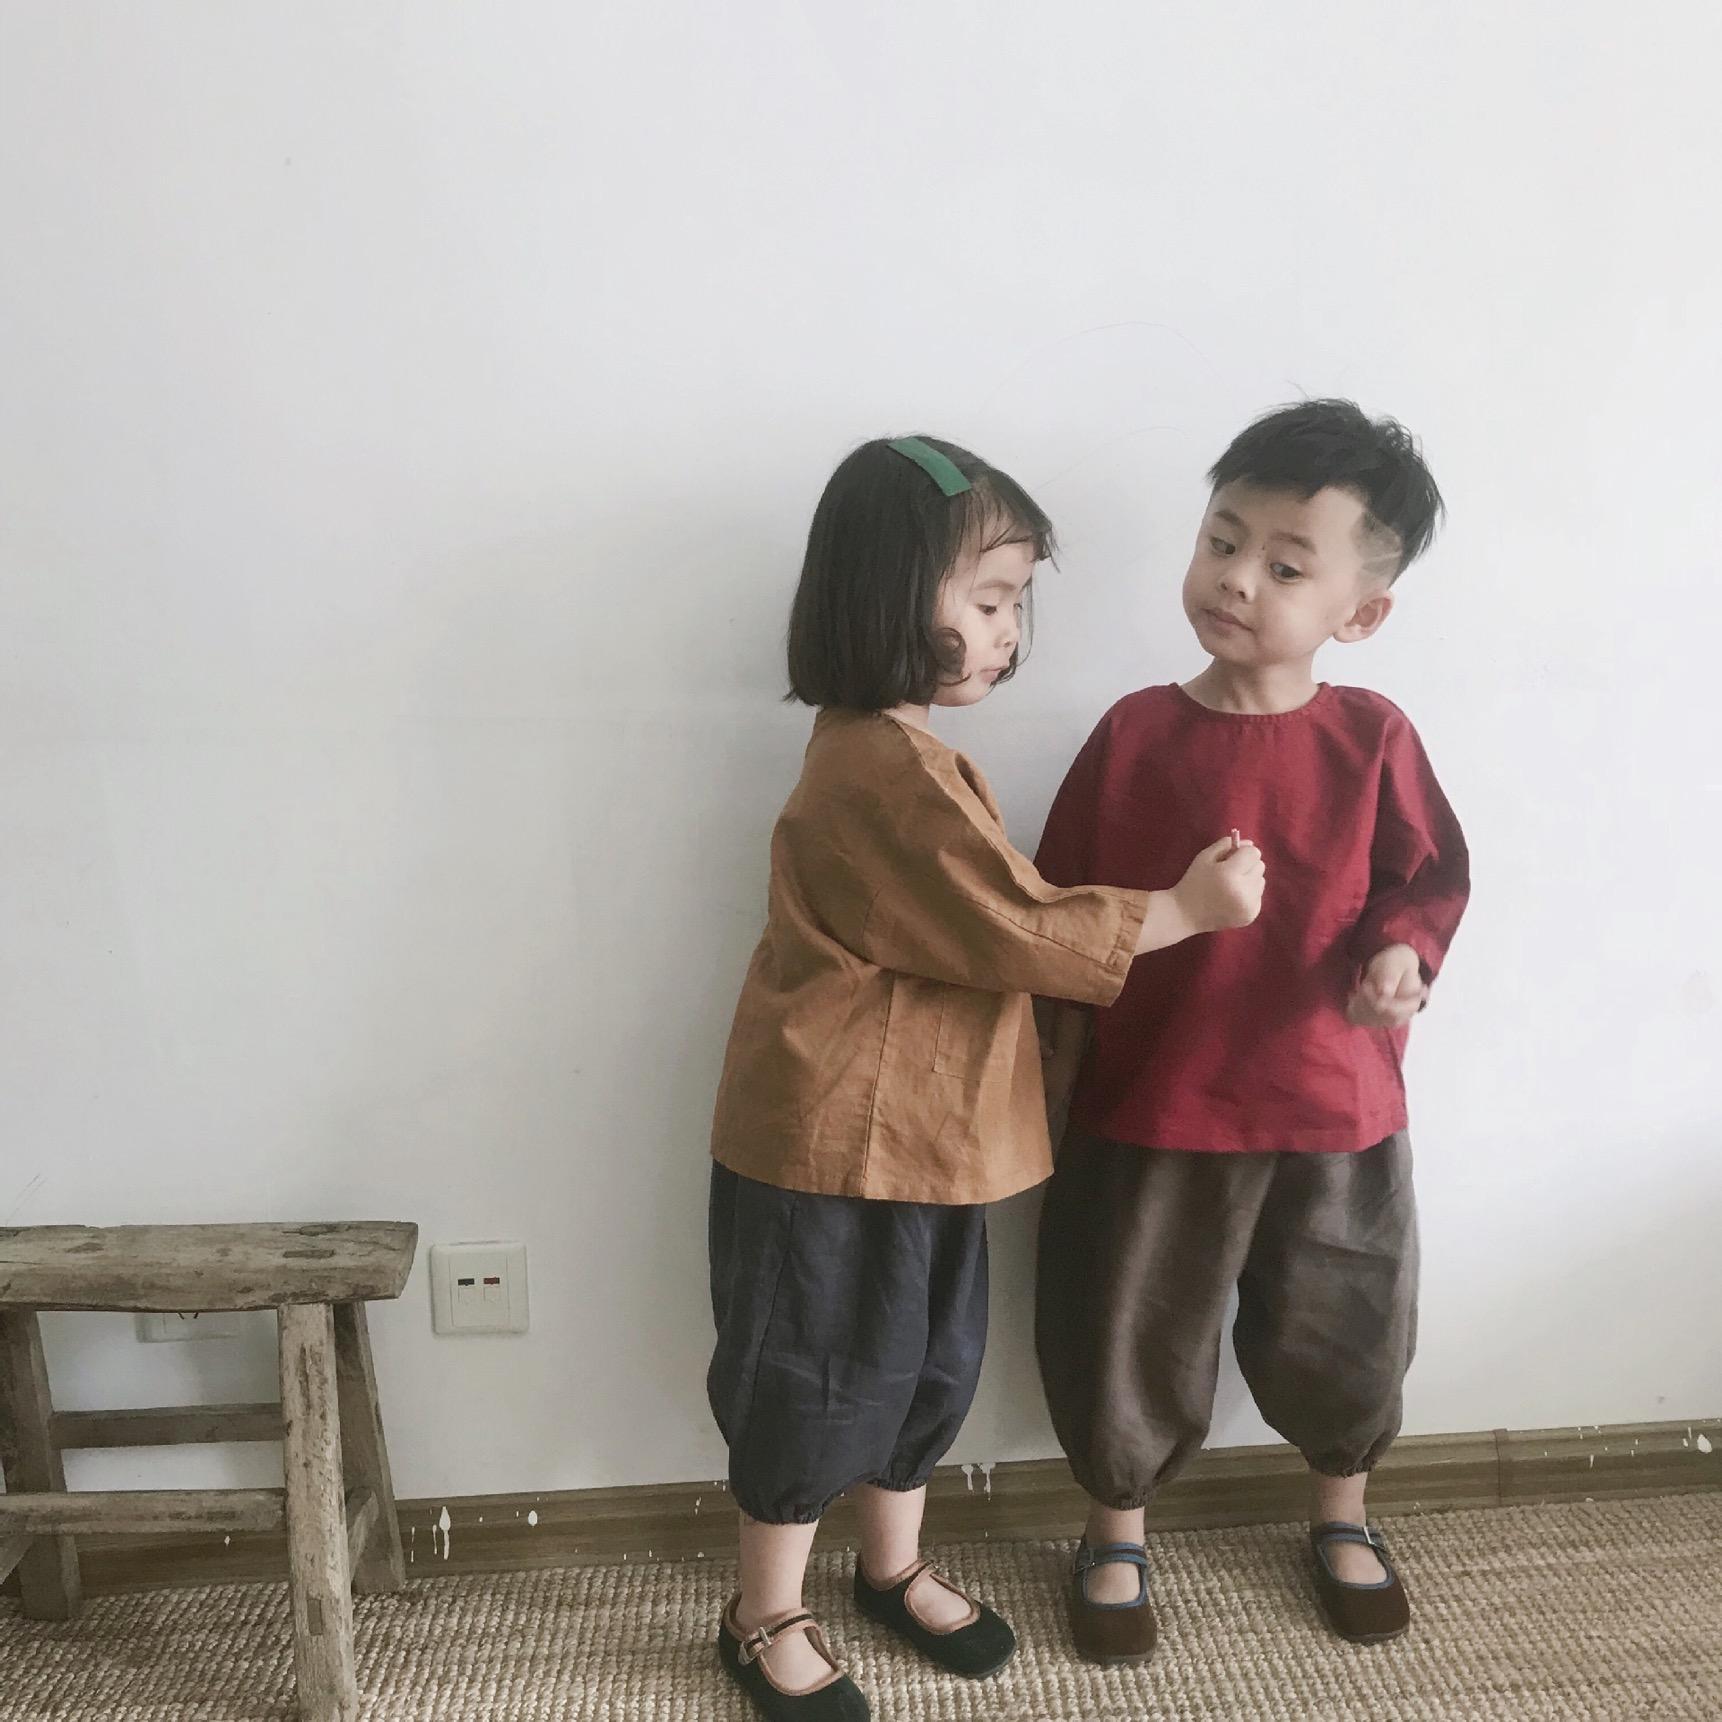 FM Japan Korean Autumn Kids Little Boys Blank Pants Organic Linen Cotton Winter Elastic Wasit Trousers Spring Unisex Children Girls Trousers